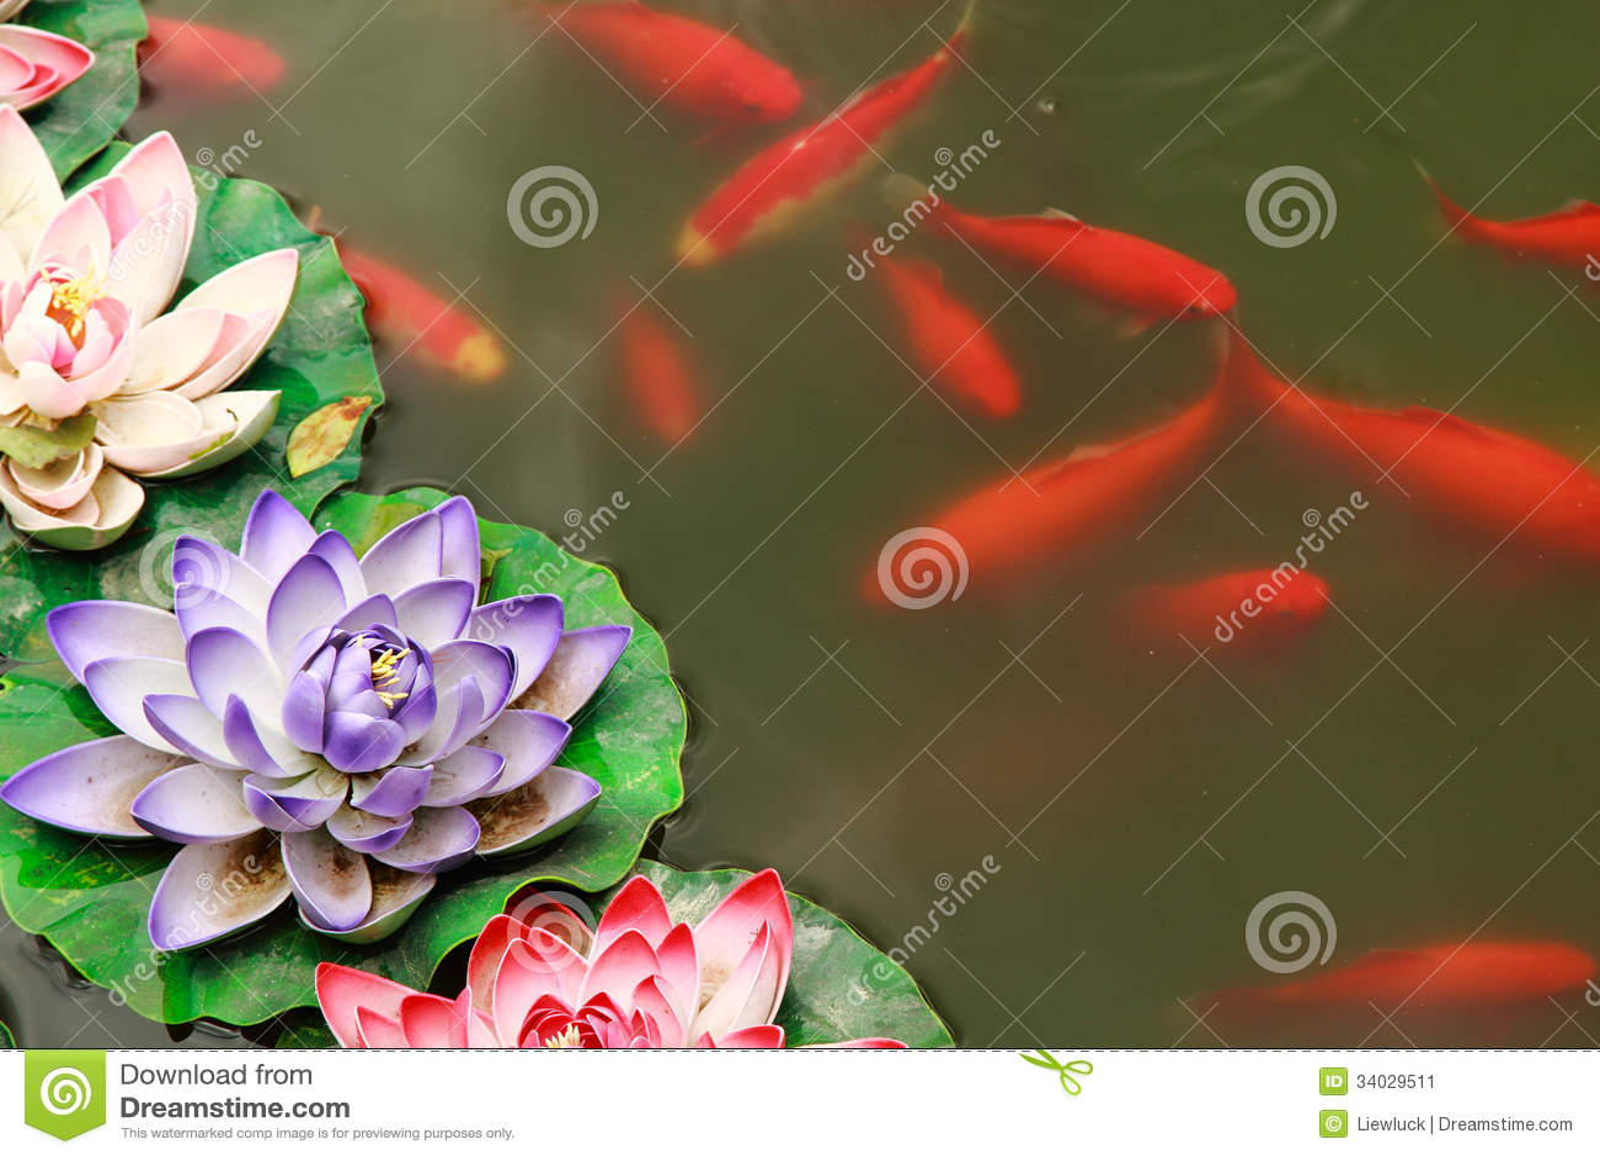 Koi in pond stock image image 34029511 for Koi fish pond lotus